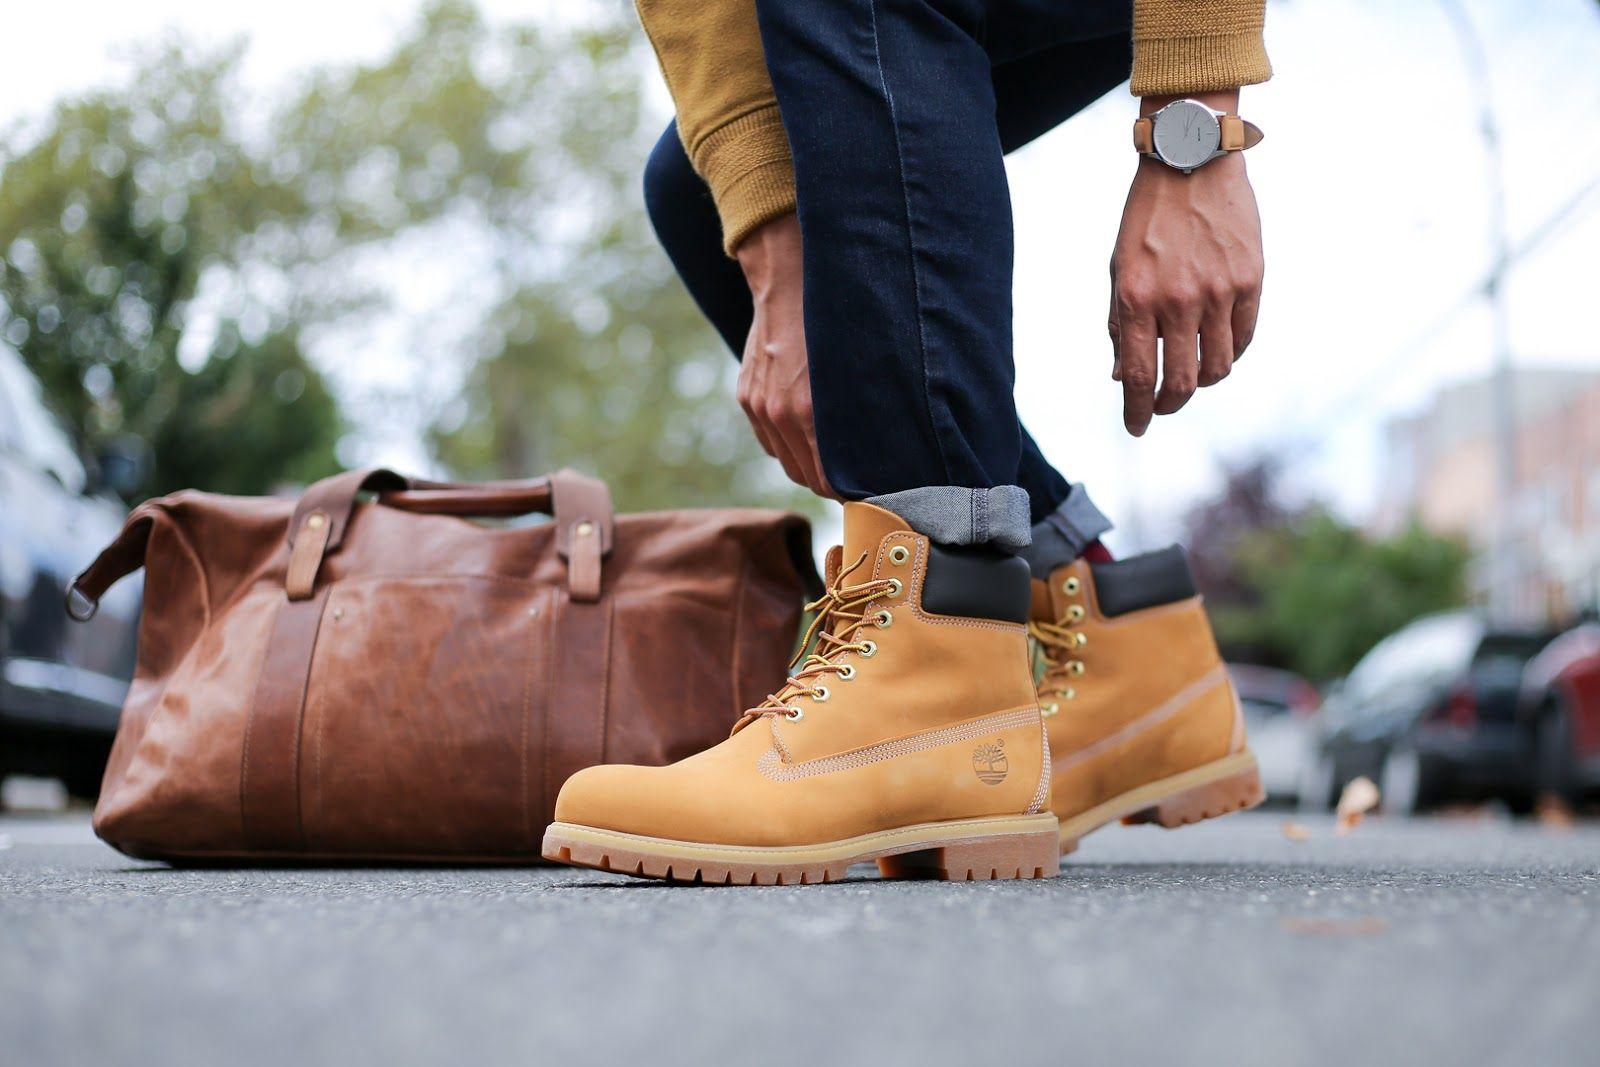 Iconic Timberland Boots Two Ways   LEVITATE STYLE